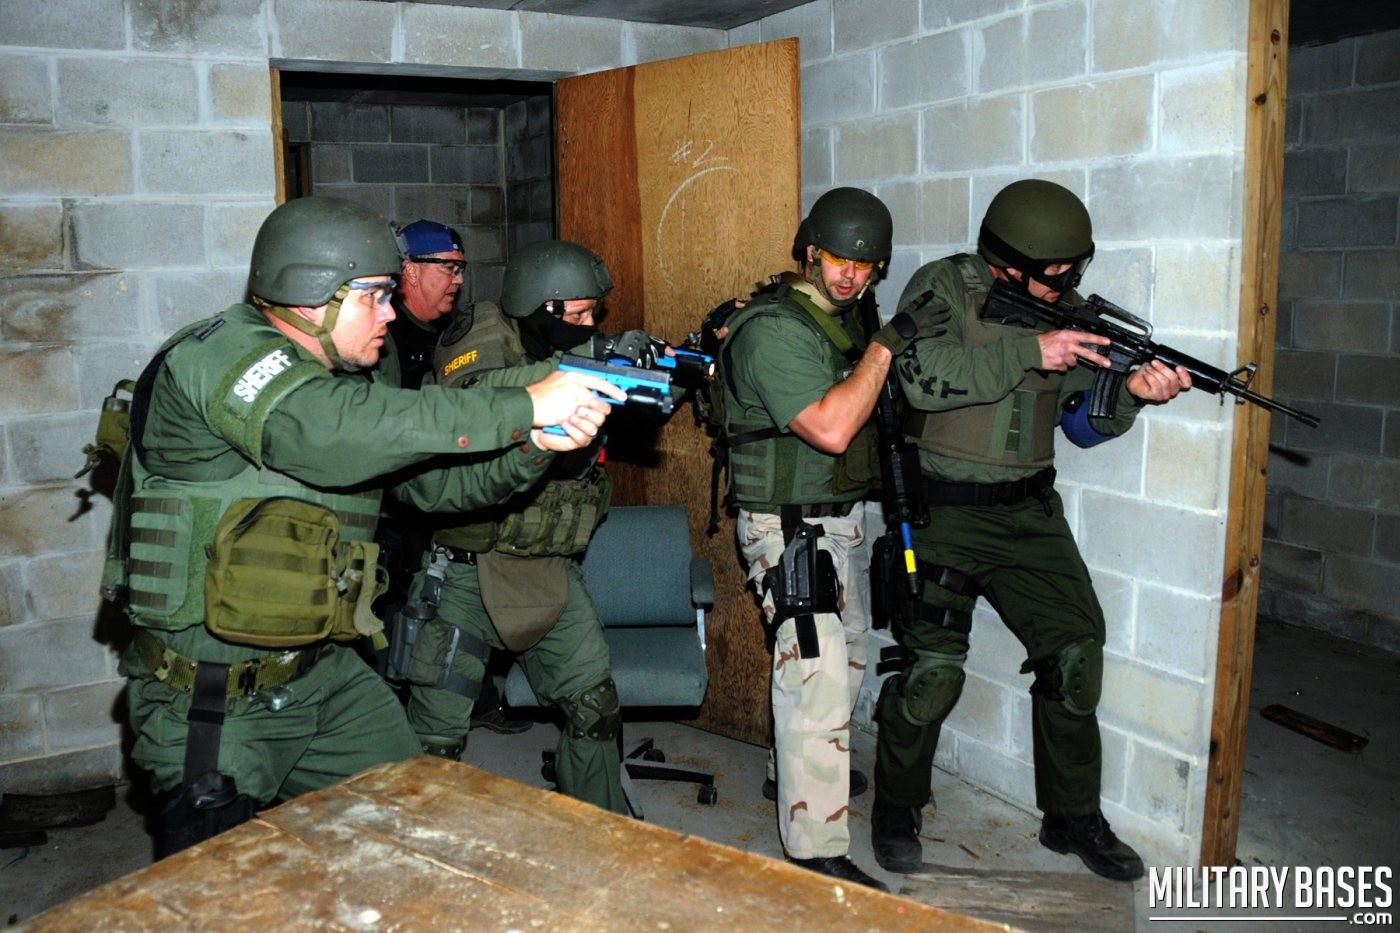 Camp Blanding Army Base In Starke Florida Militarybases Com